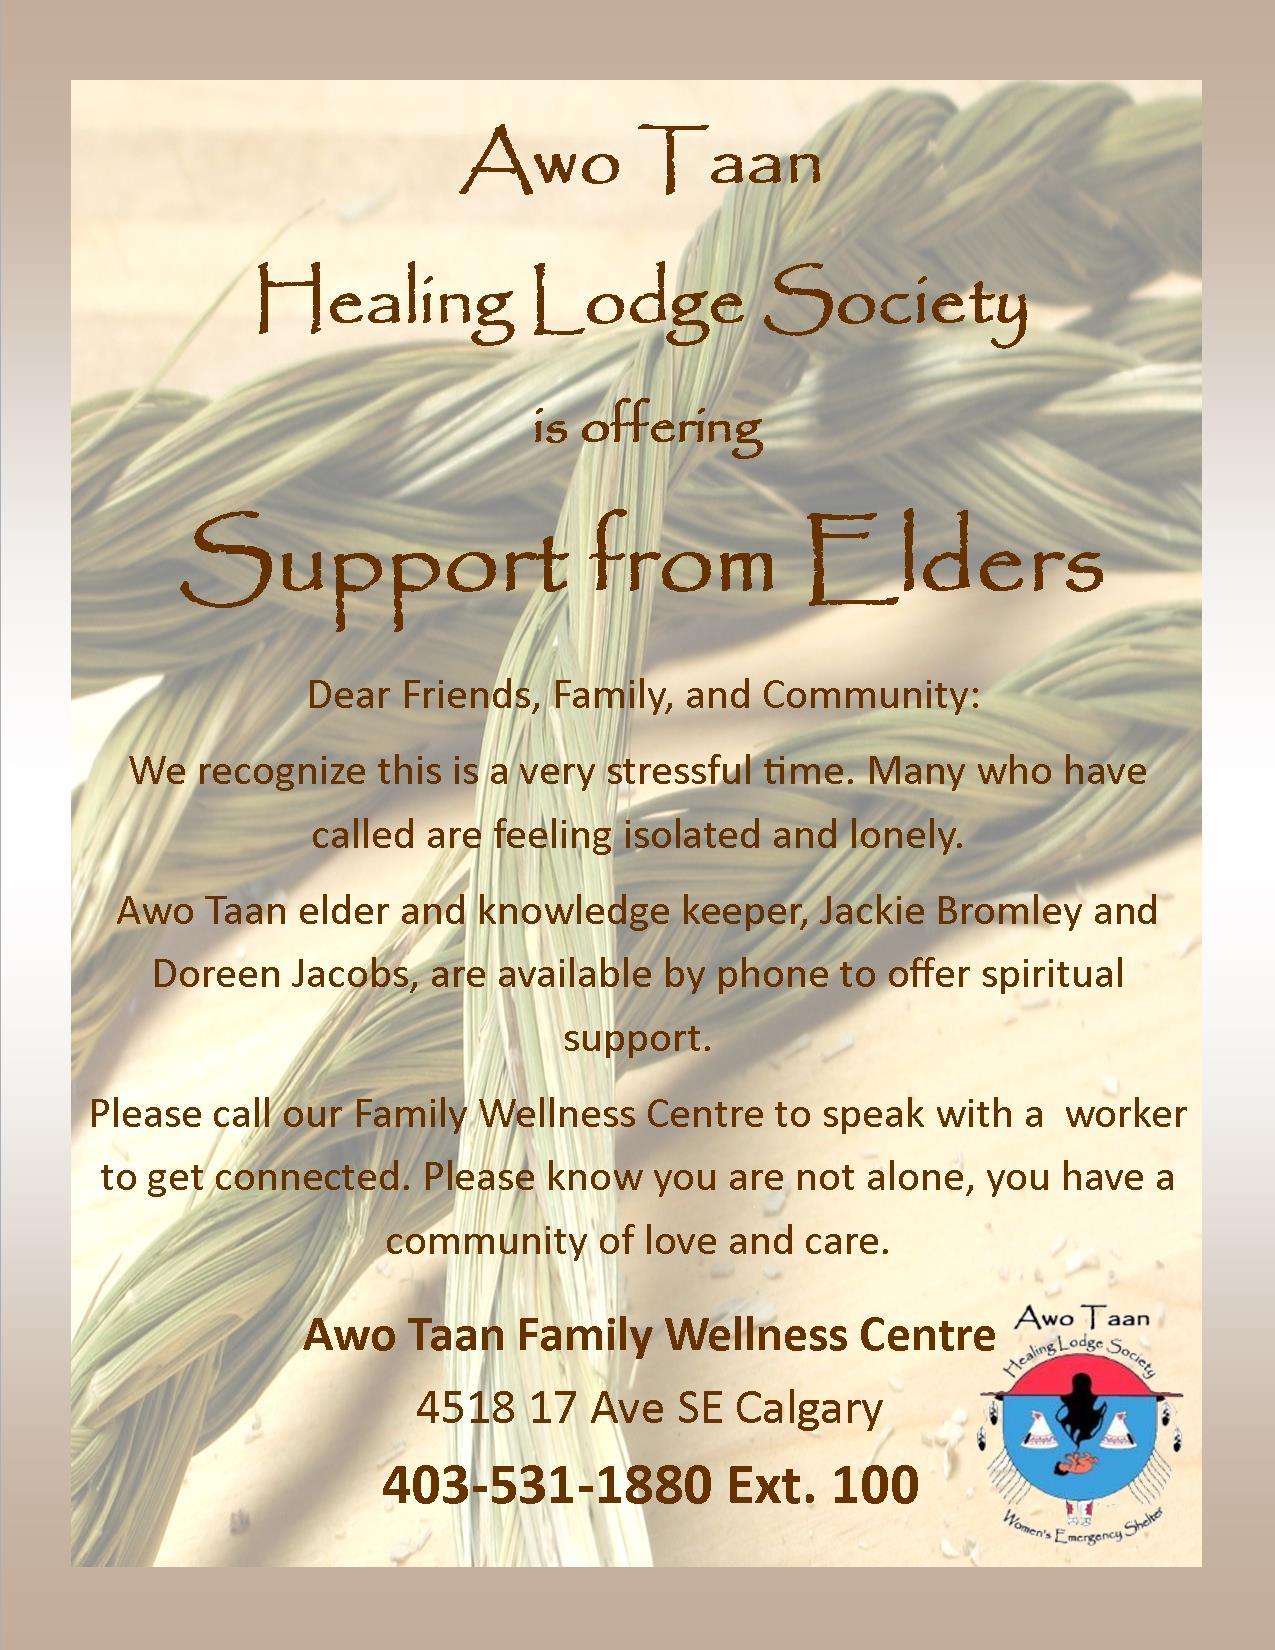 Awo Taan support from Elders